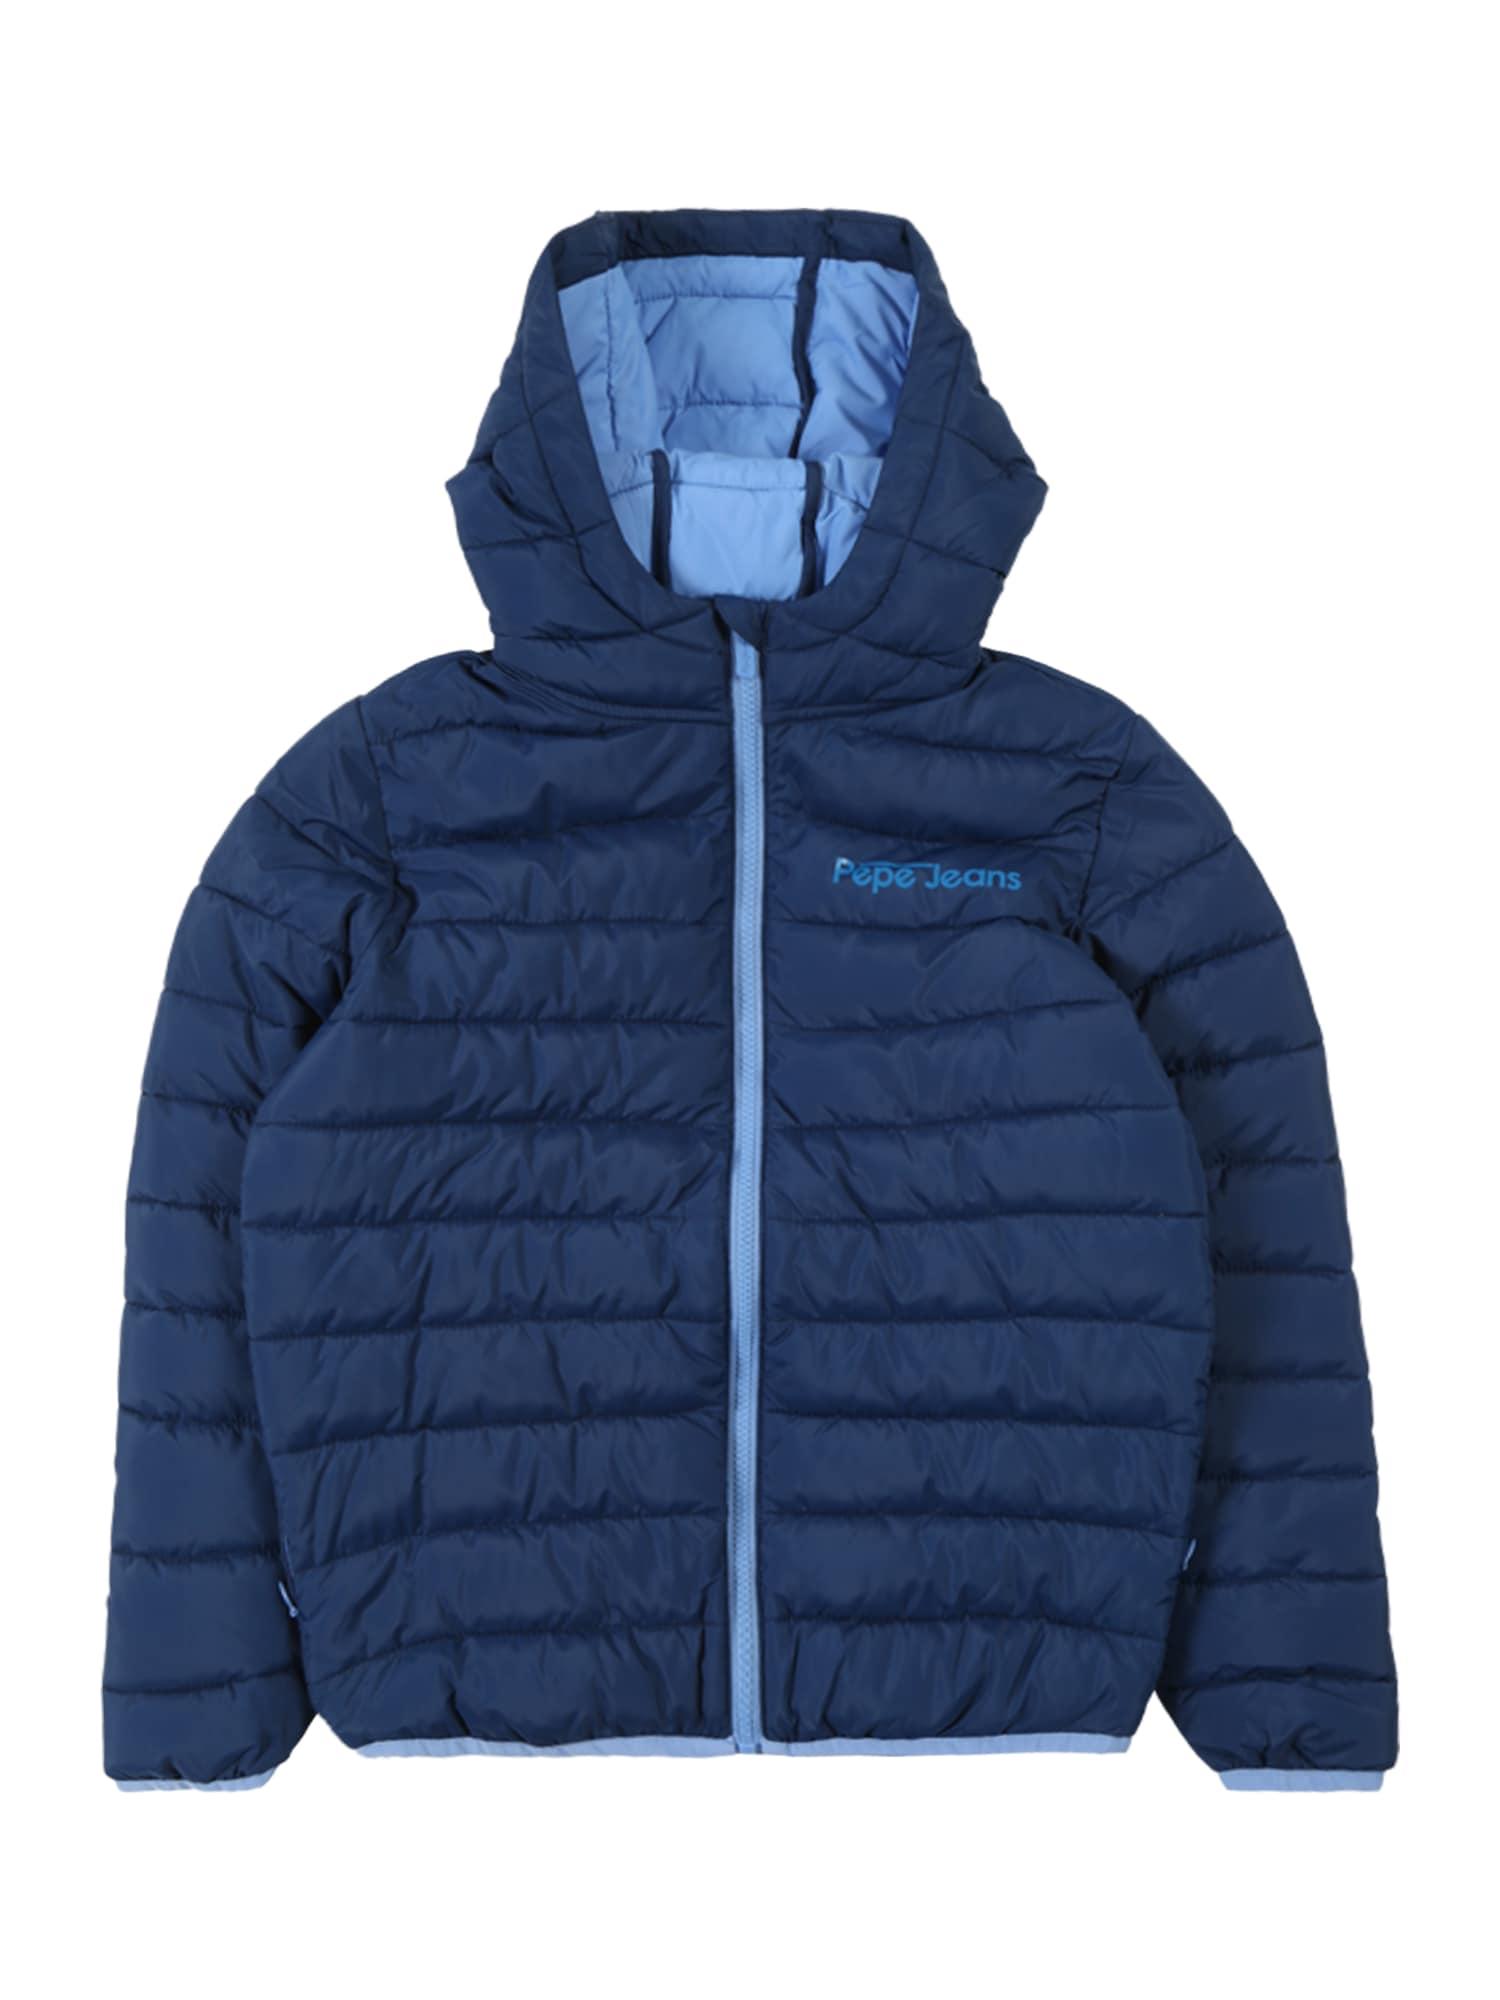 Přechodná bunda DURHAM modrá Pepe Jeans